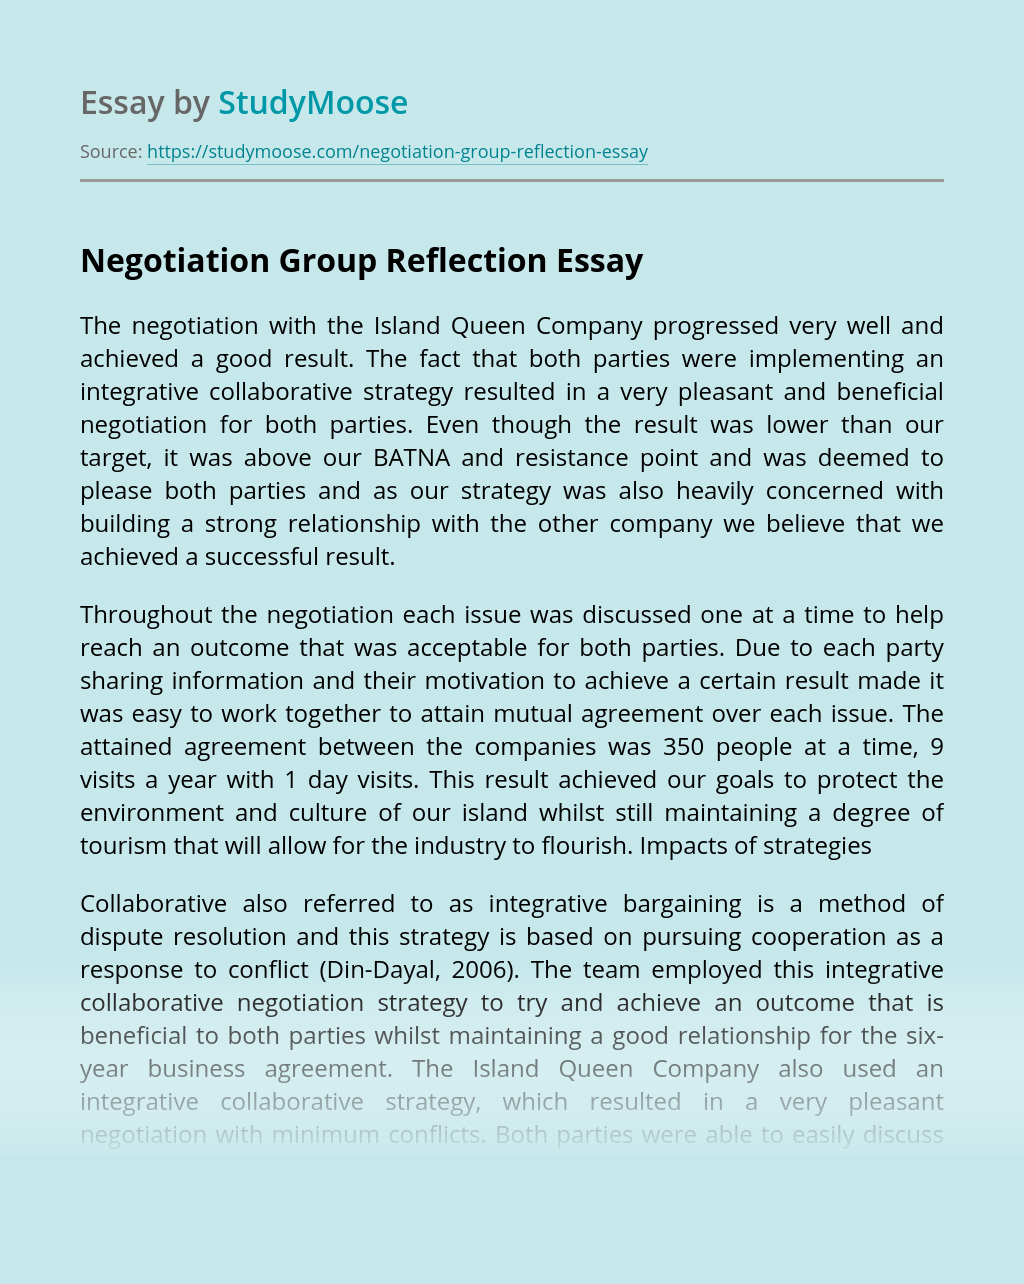 Negotiation Group Reflection